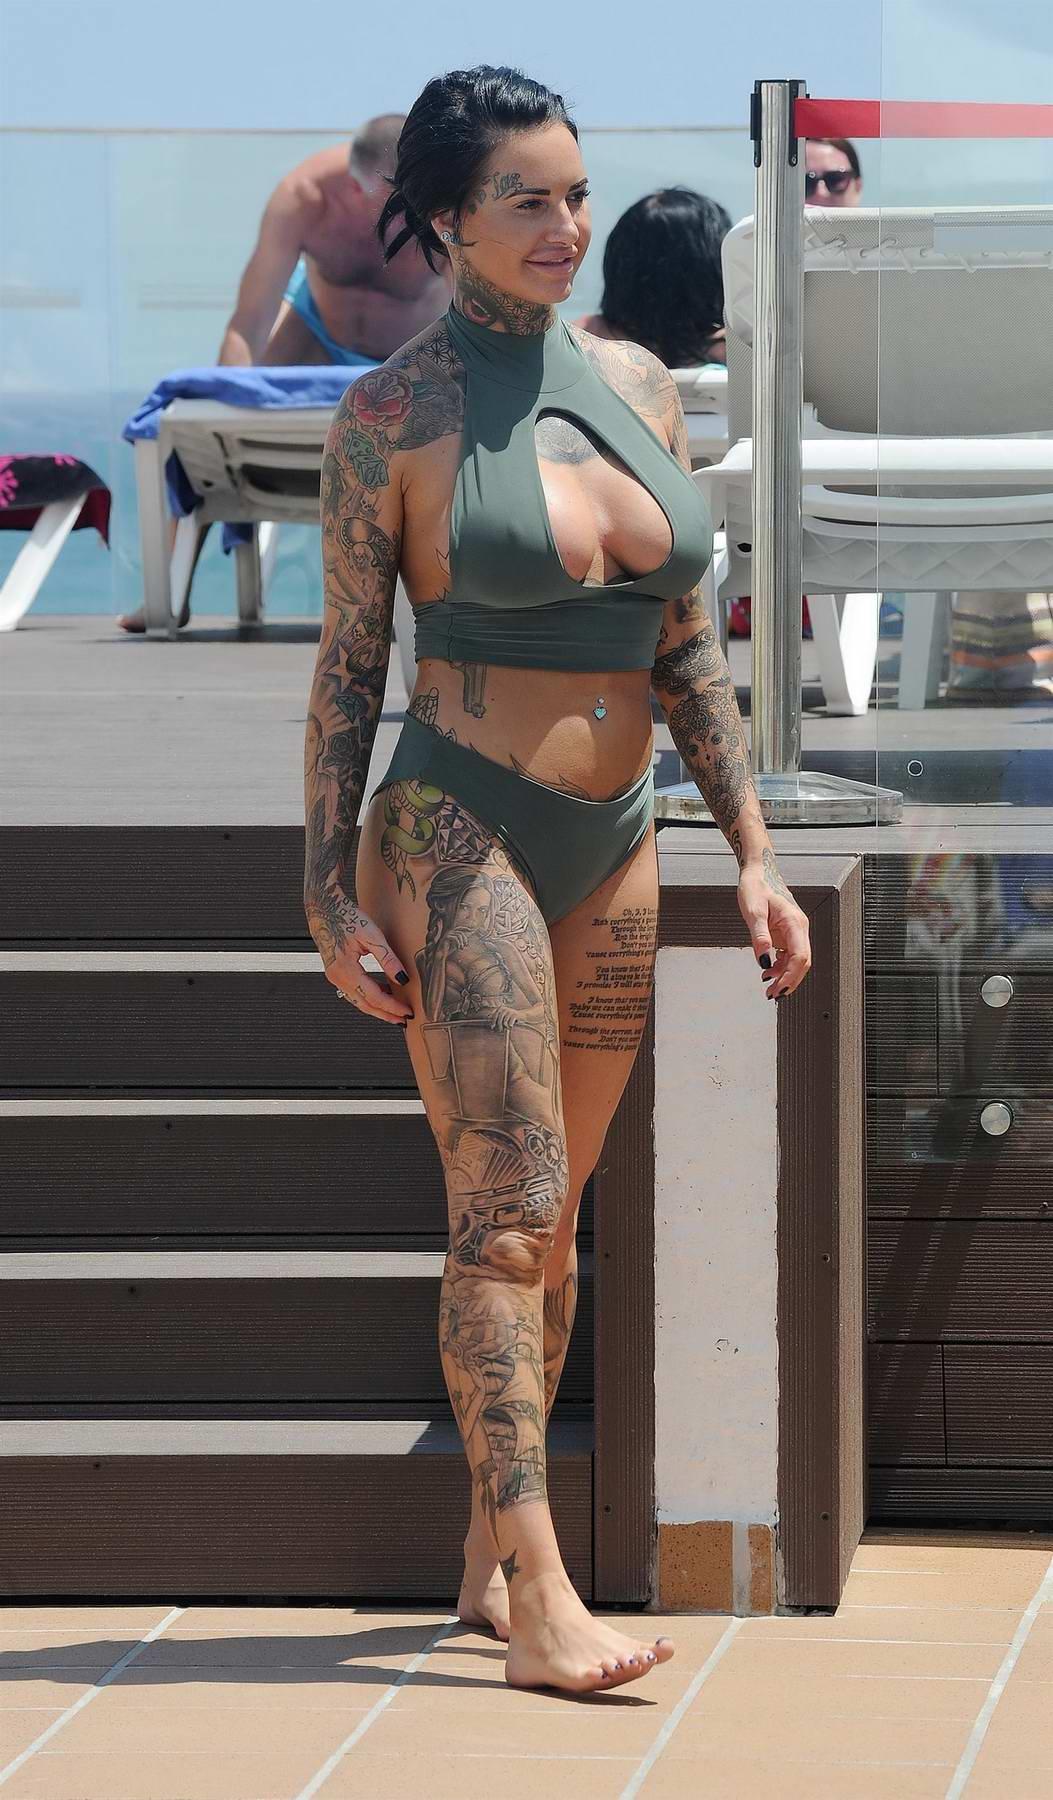 Pussy Geraldine Smith (actress) nudes (58 photo) Erotica, Twitter, bra